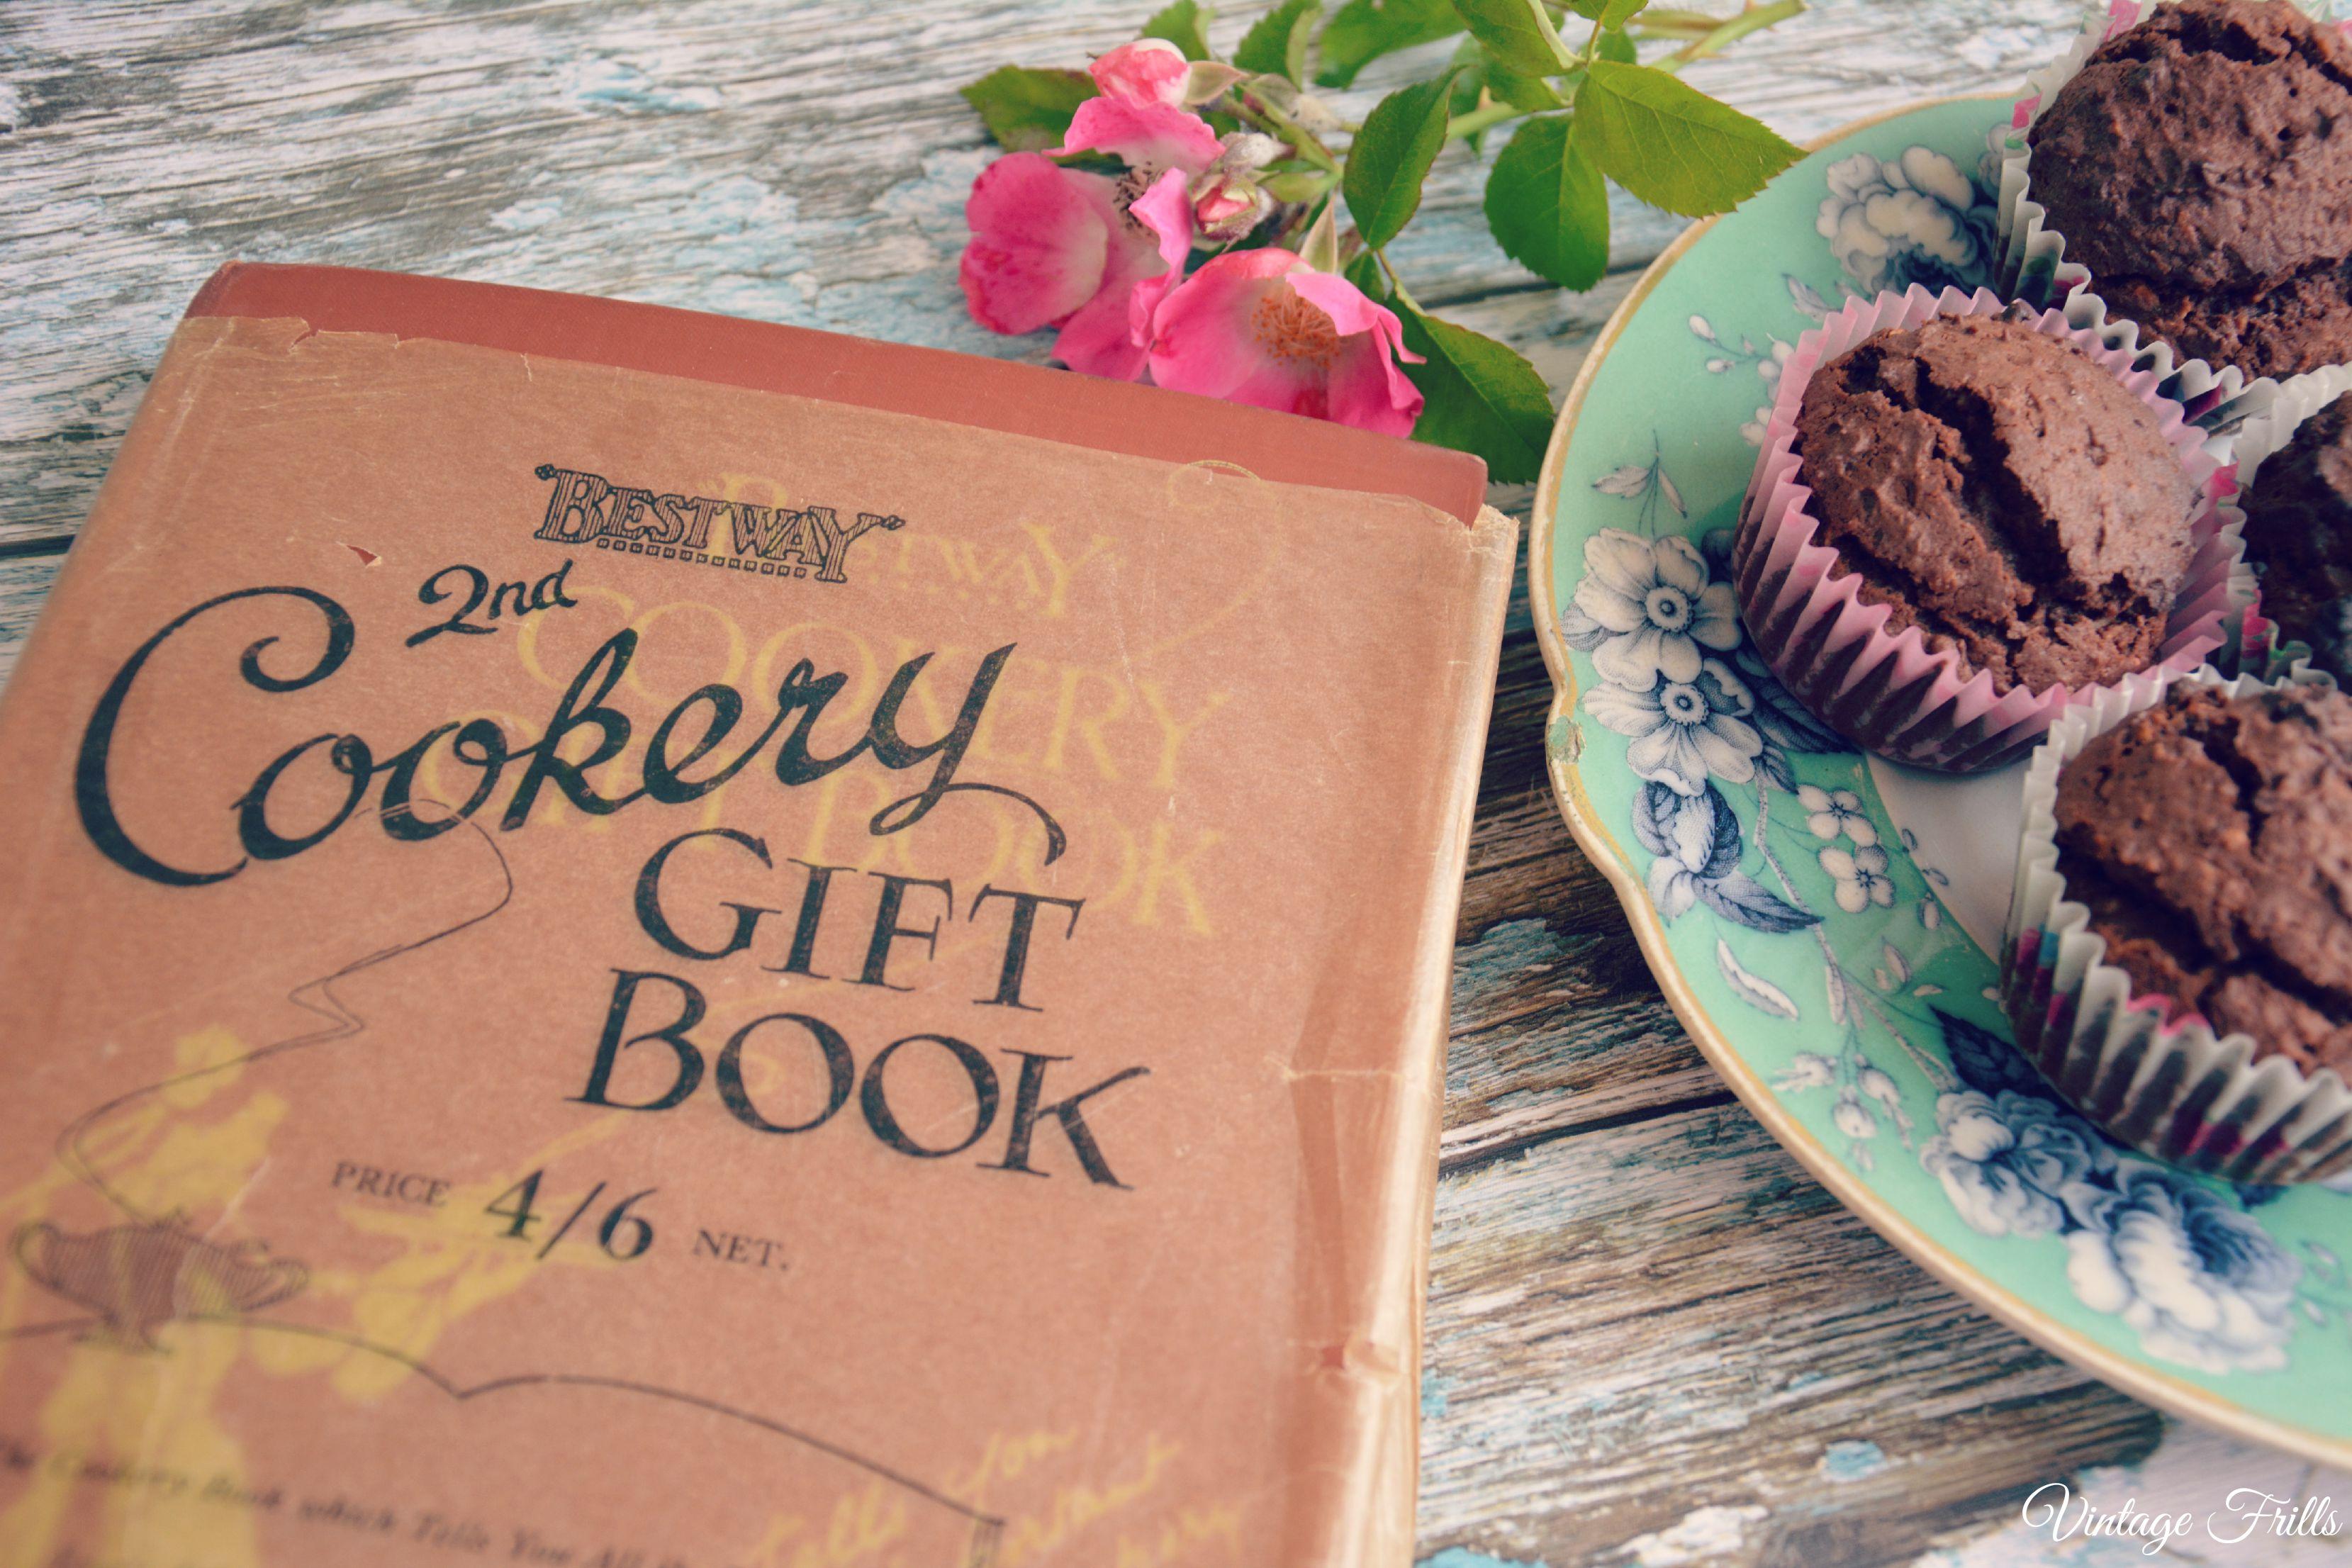 Bestway Cookery Gift Book